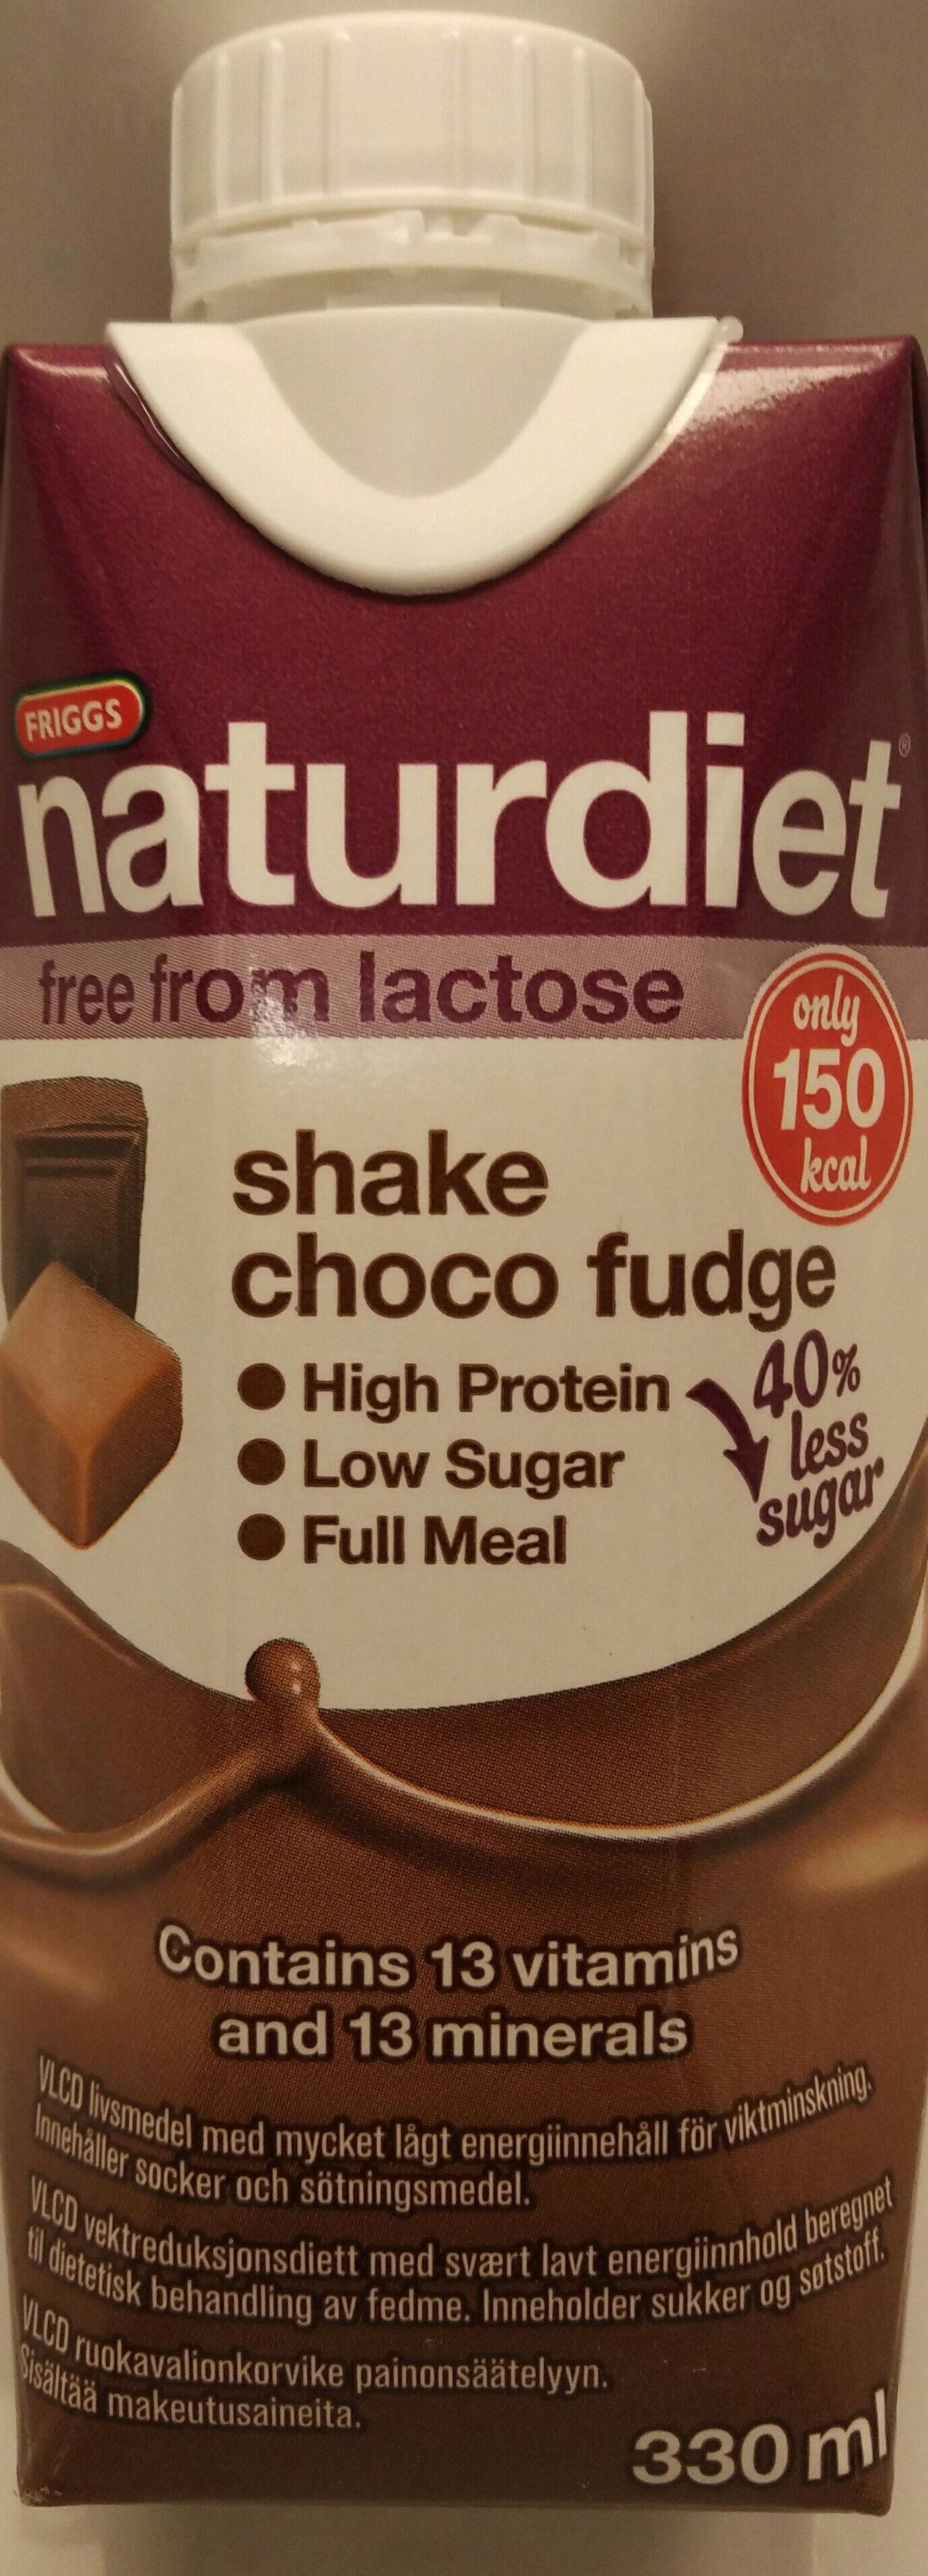 Friggs naturdiet / shake choco fudge - Produit - en